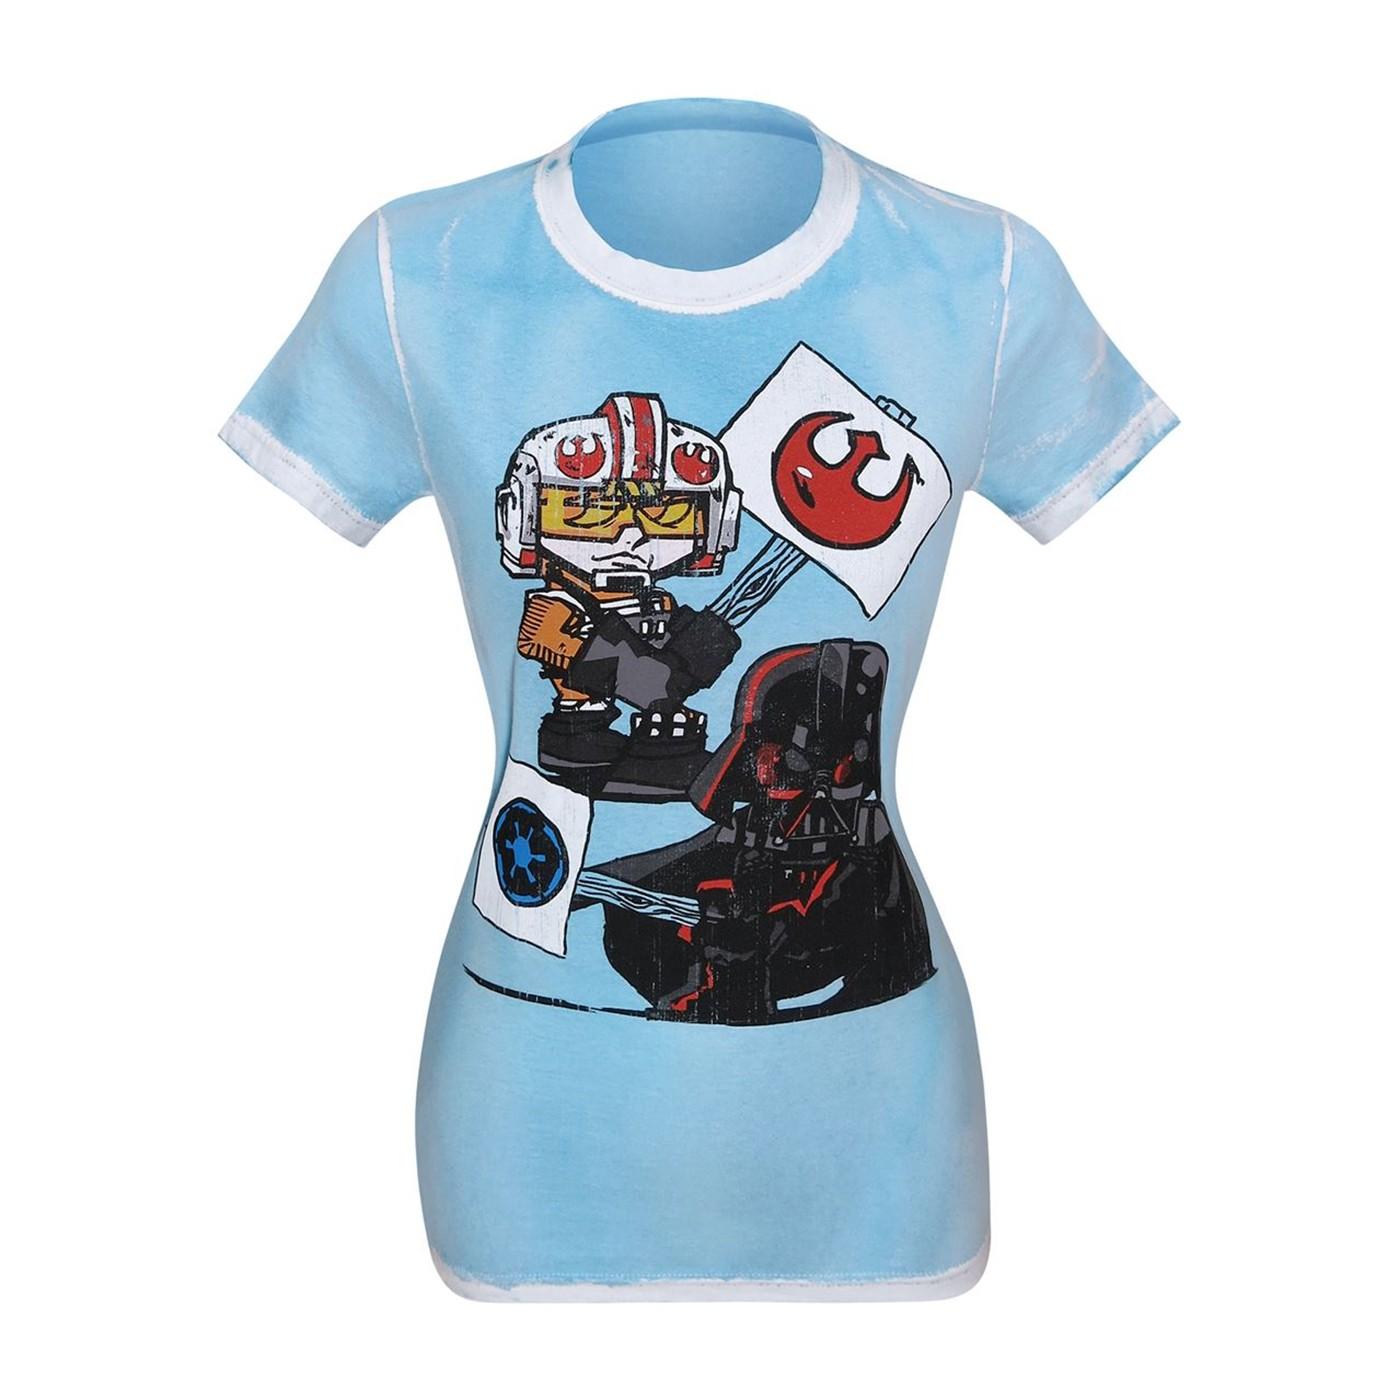 Star Wars Picket Signs Women's T-Shirt